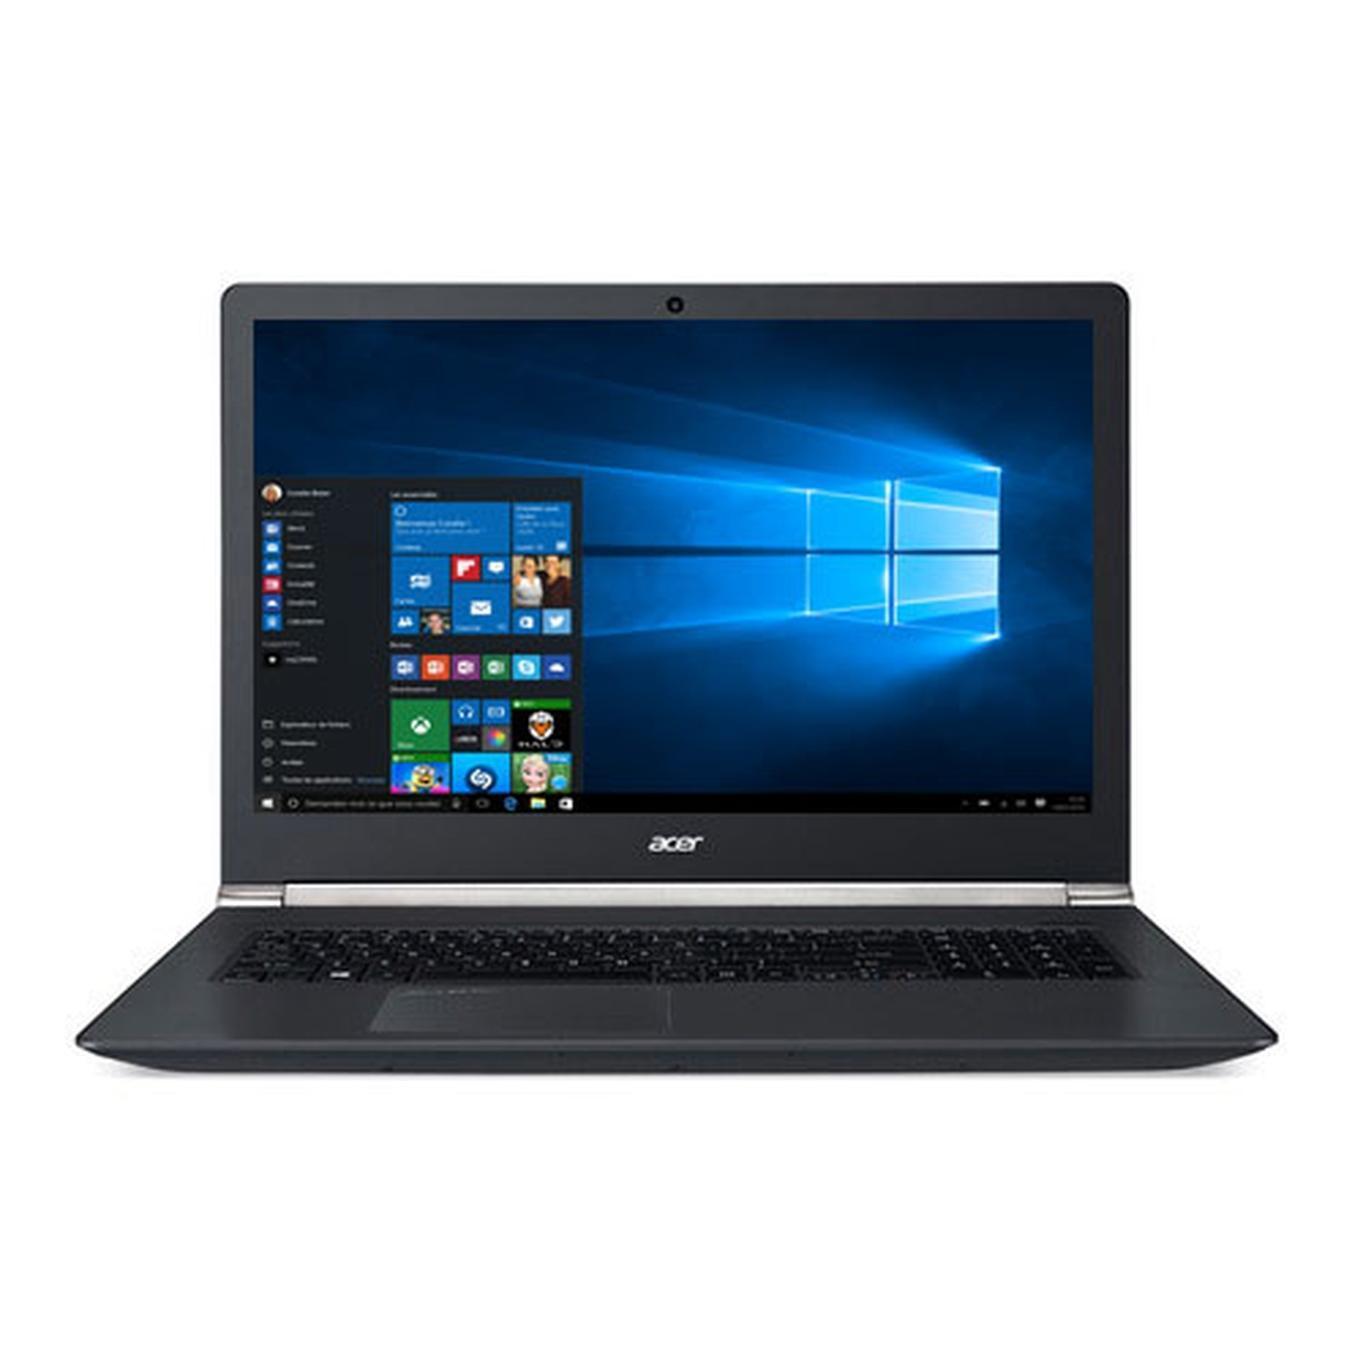 "Acer VN7-792G-58JT 17,3"" i5-6300HQ 2,3 GHz  - 128 Go HDD + SSD - RAM 8 Go- Nvidia GeForce GTX 950M"